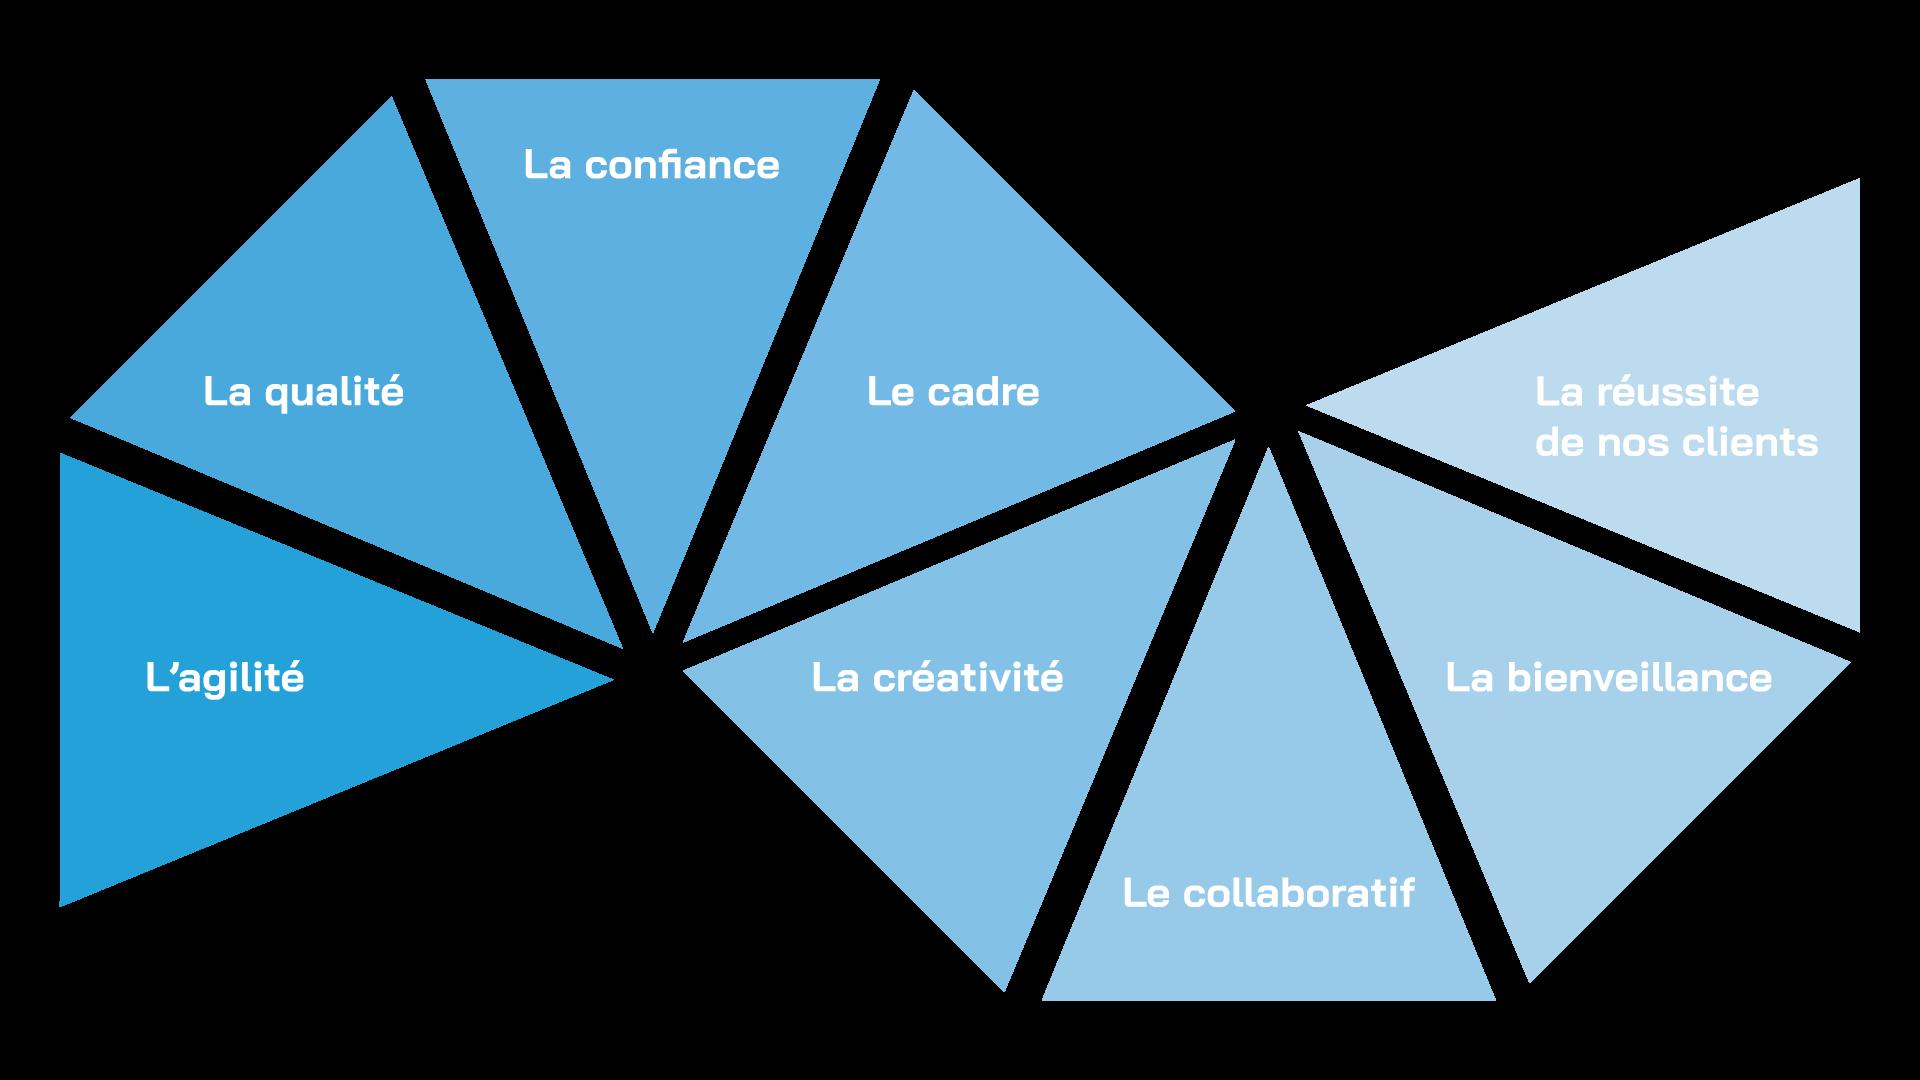 Les 8 valeurs d'Octinov